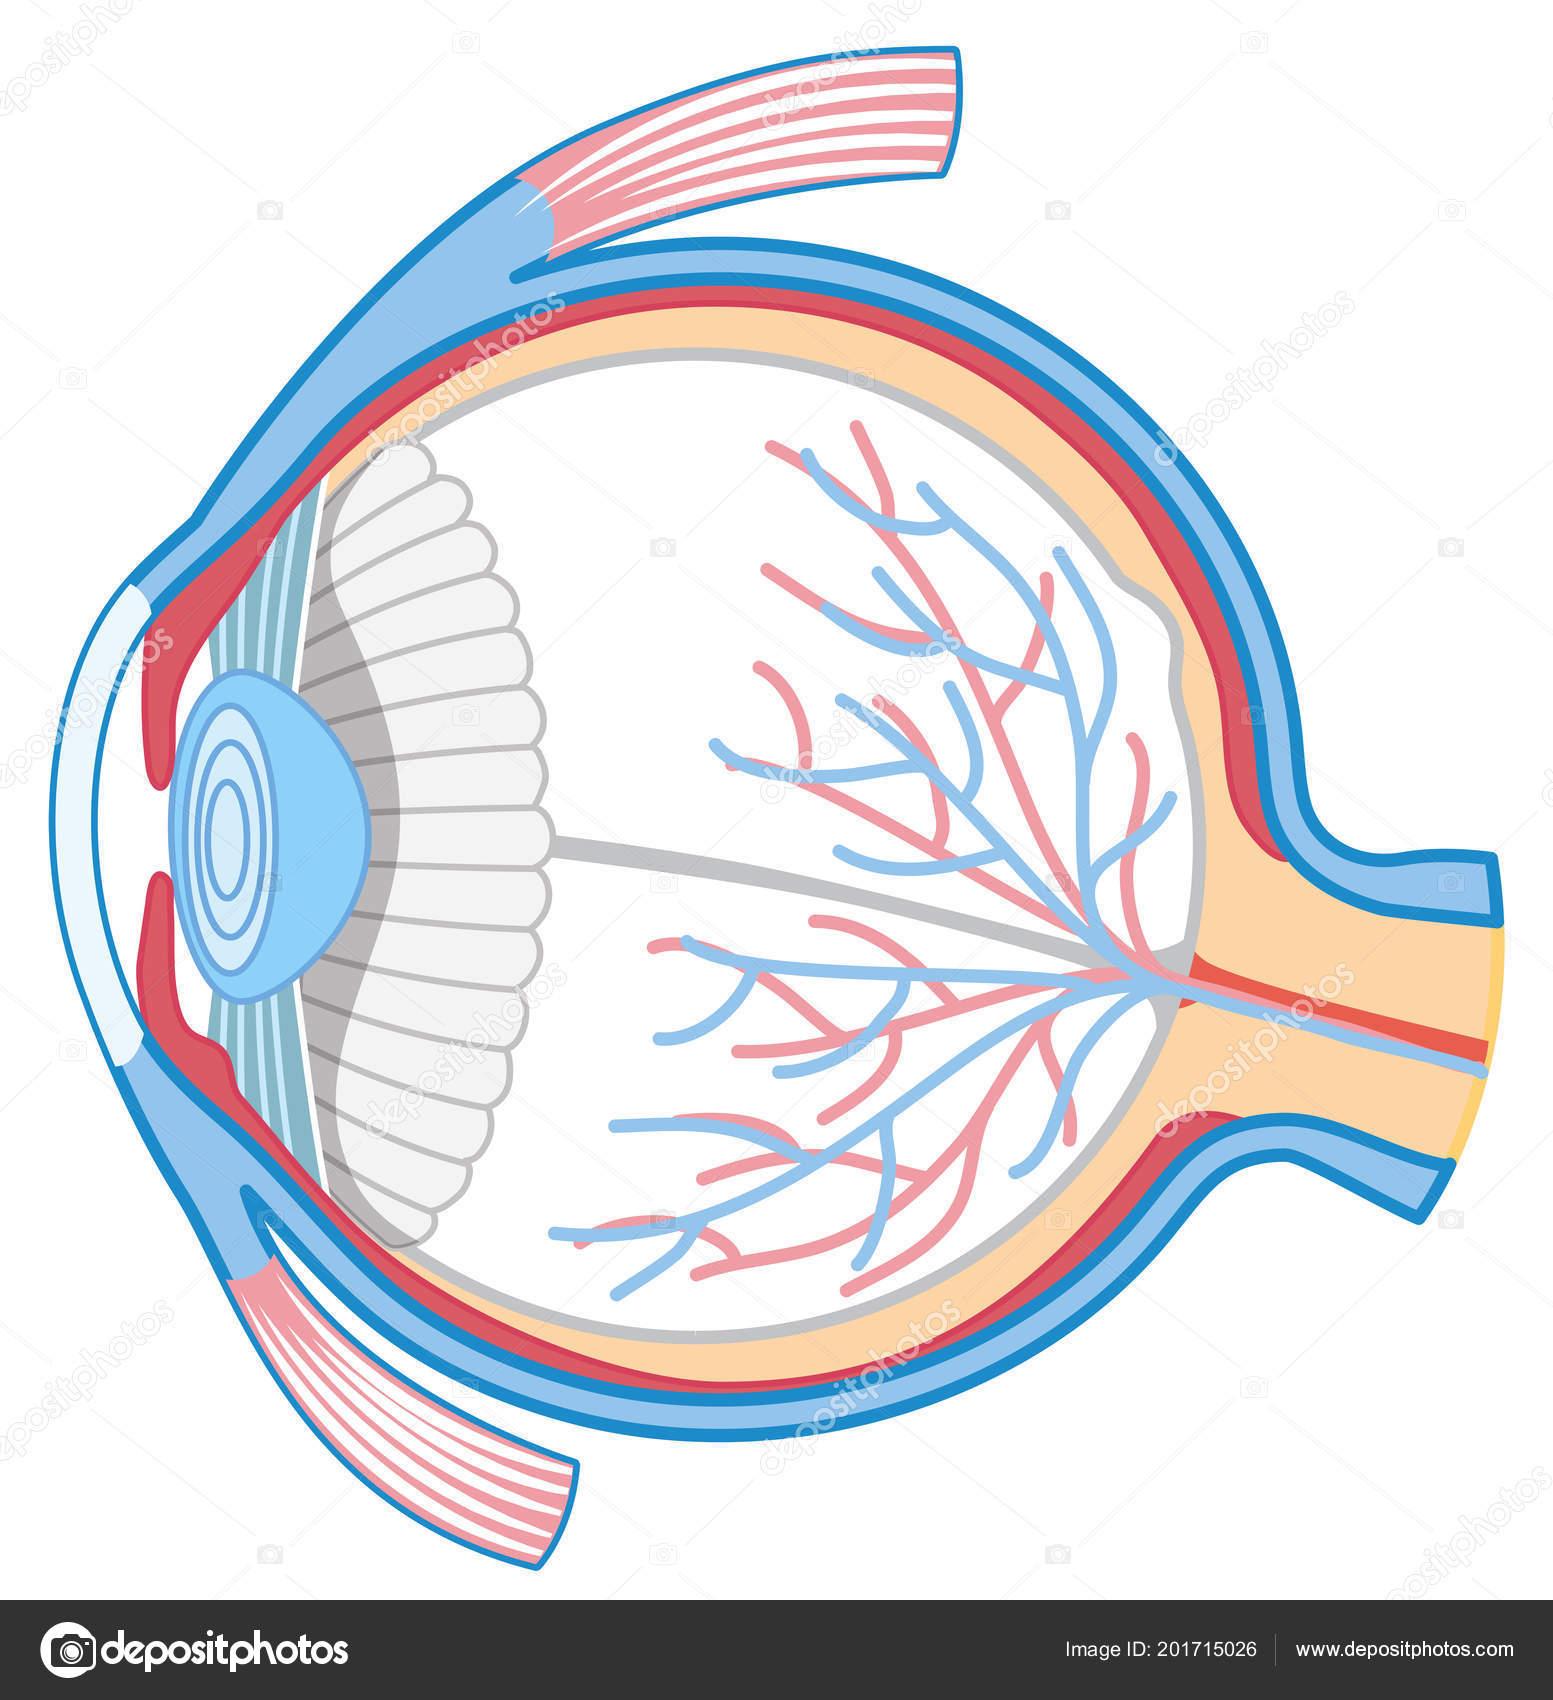 Anatomy Human Eye Illustration Stock Vector Brgfx 201715026